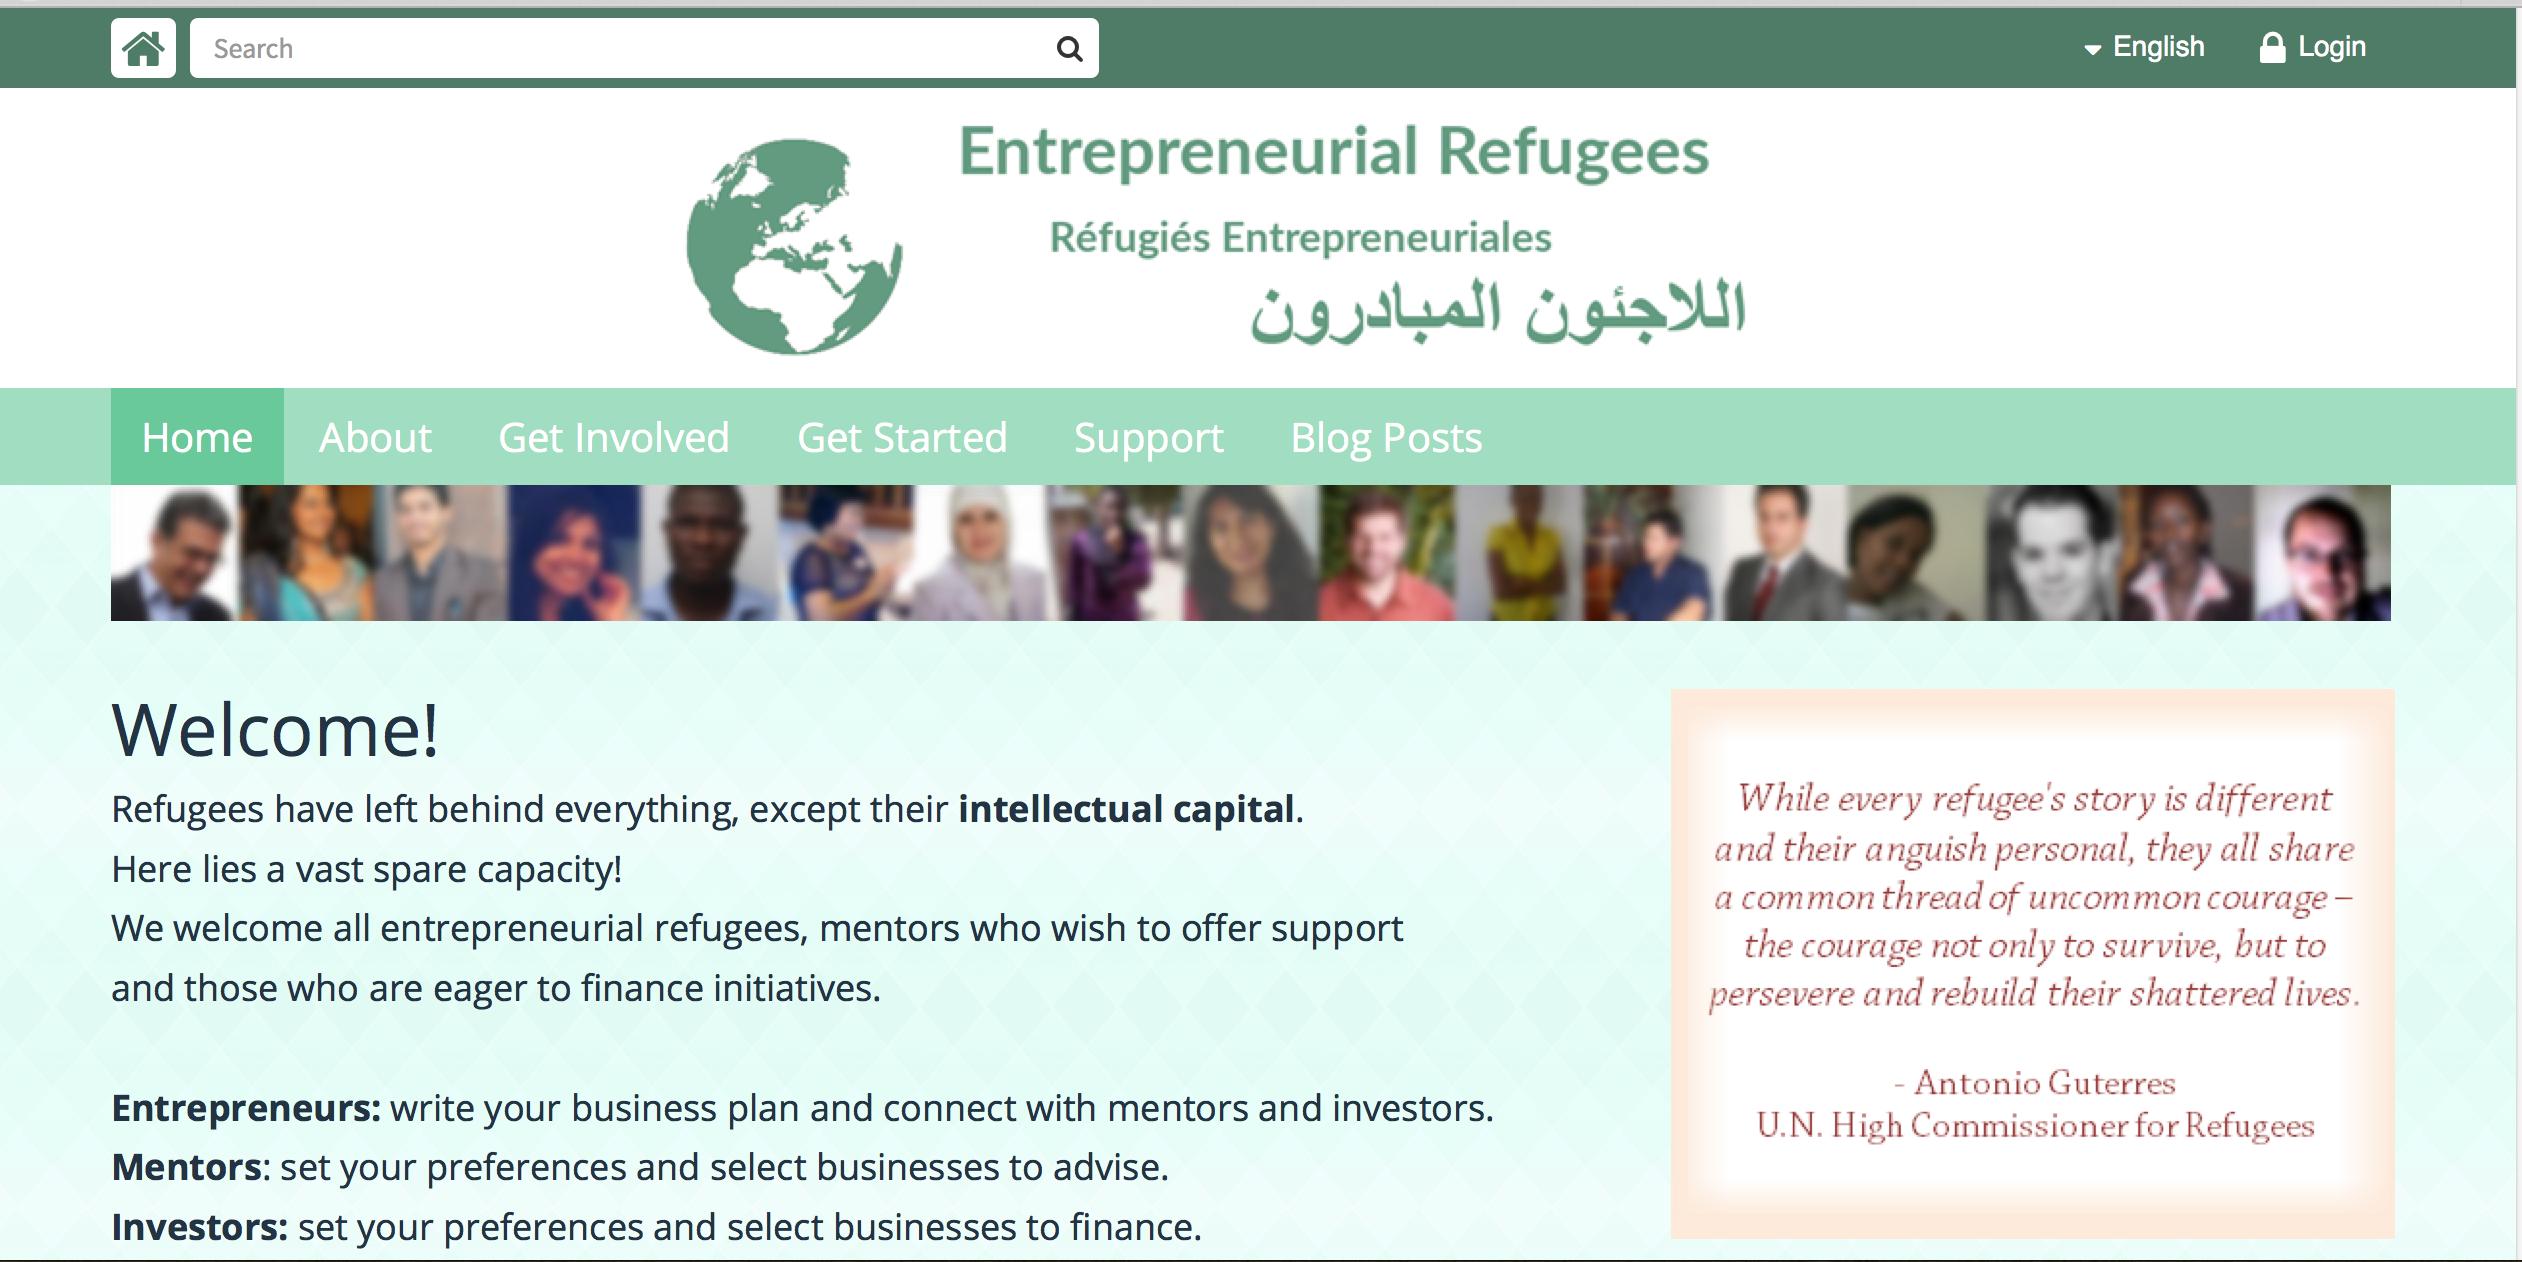 Entrepreneurial Refugees homepage